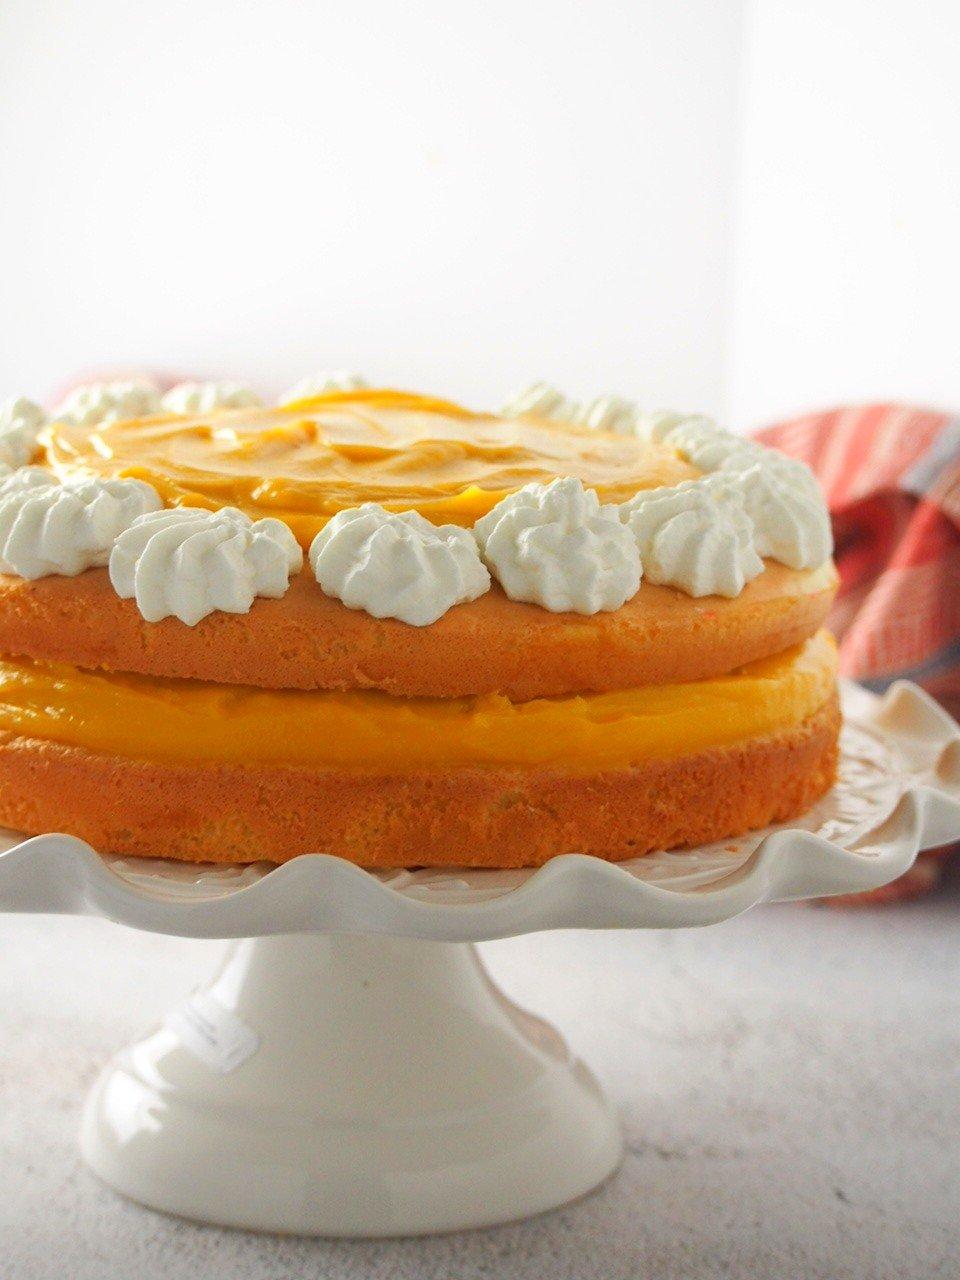 Mango Cream Cake on a cake stand.